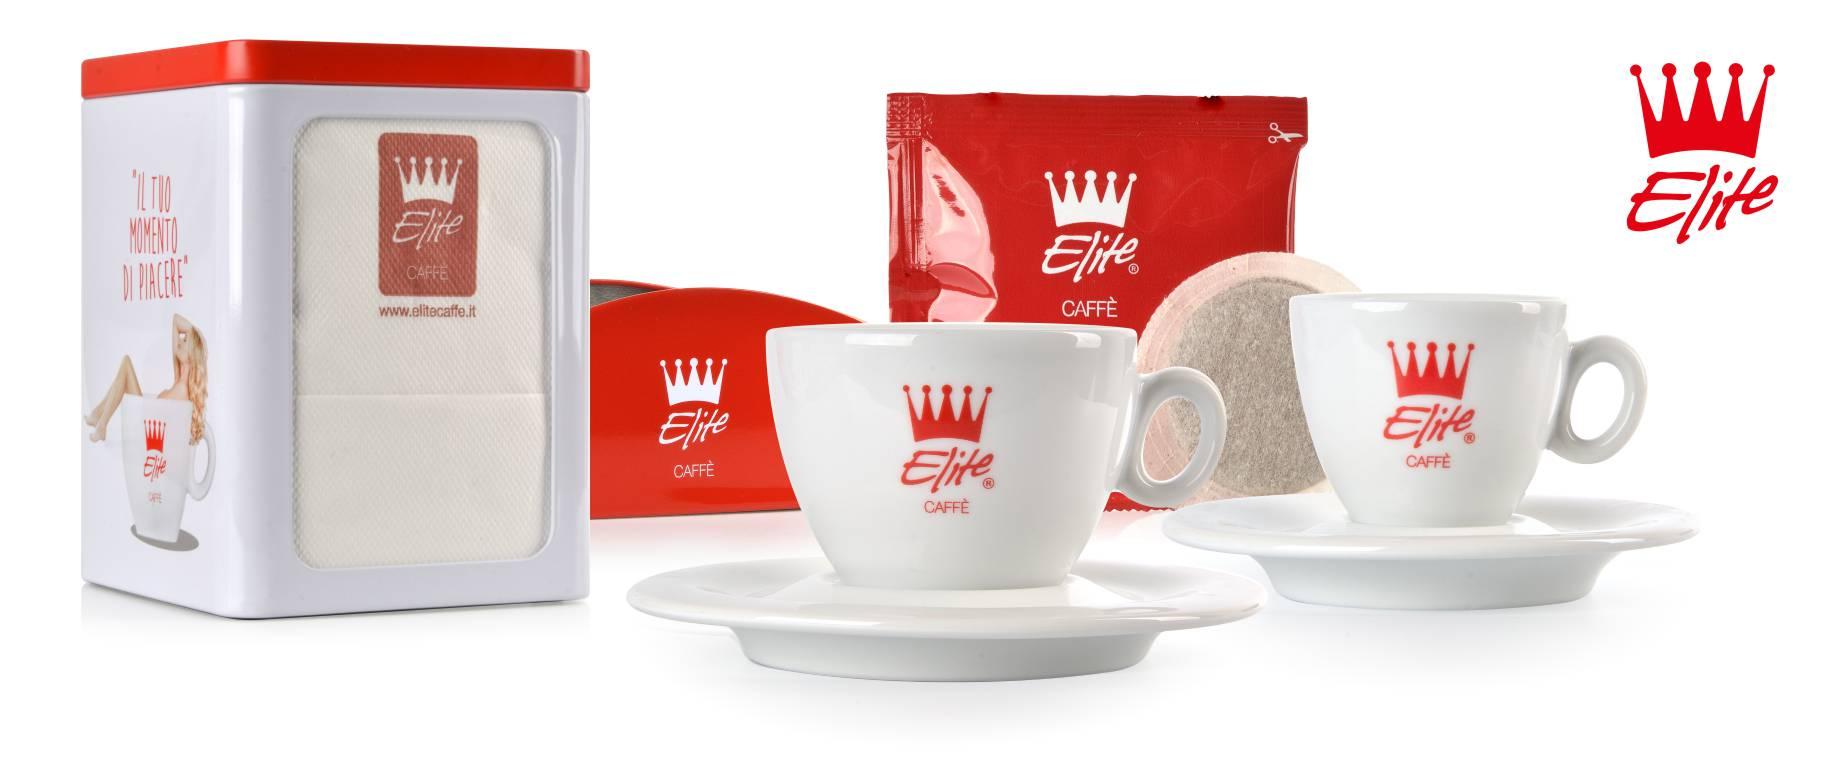 Elite Caffè Prodotti